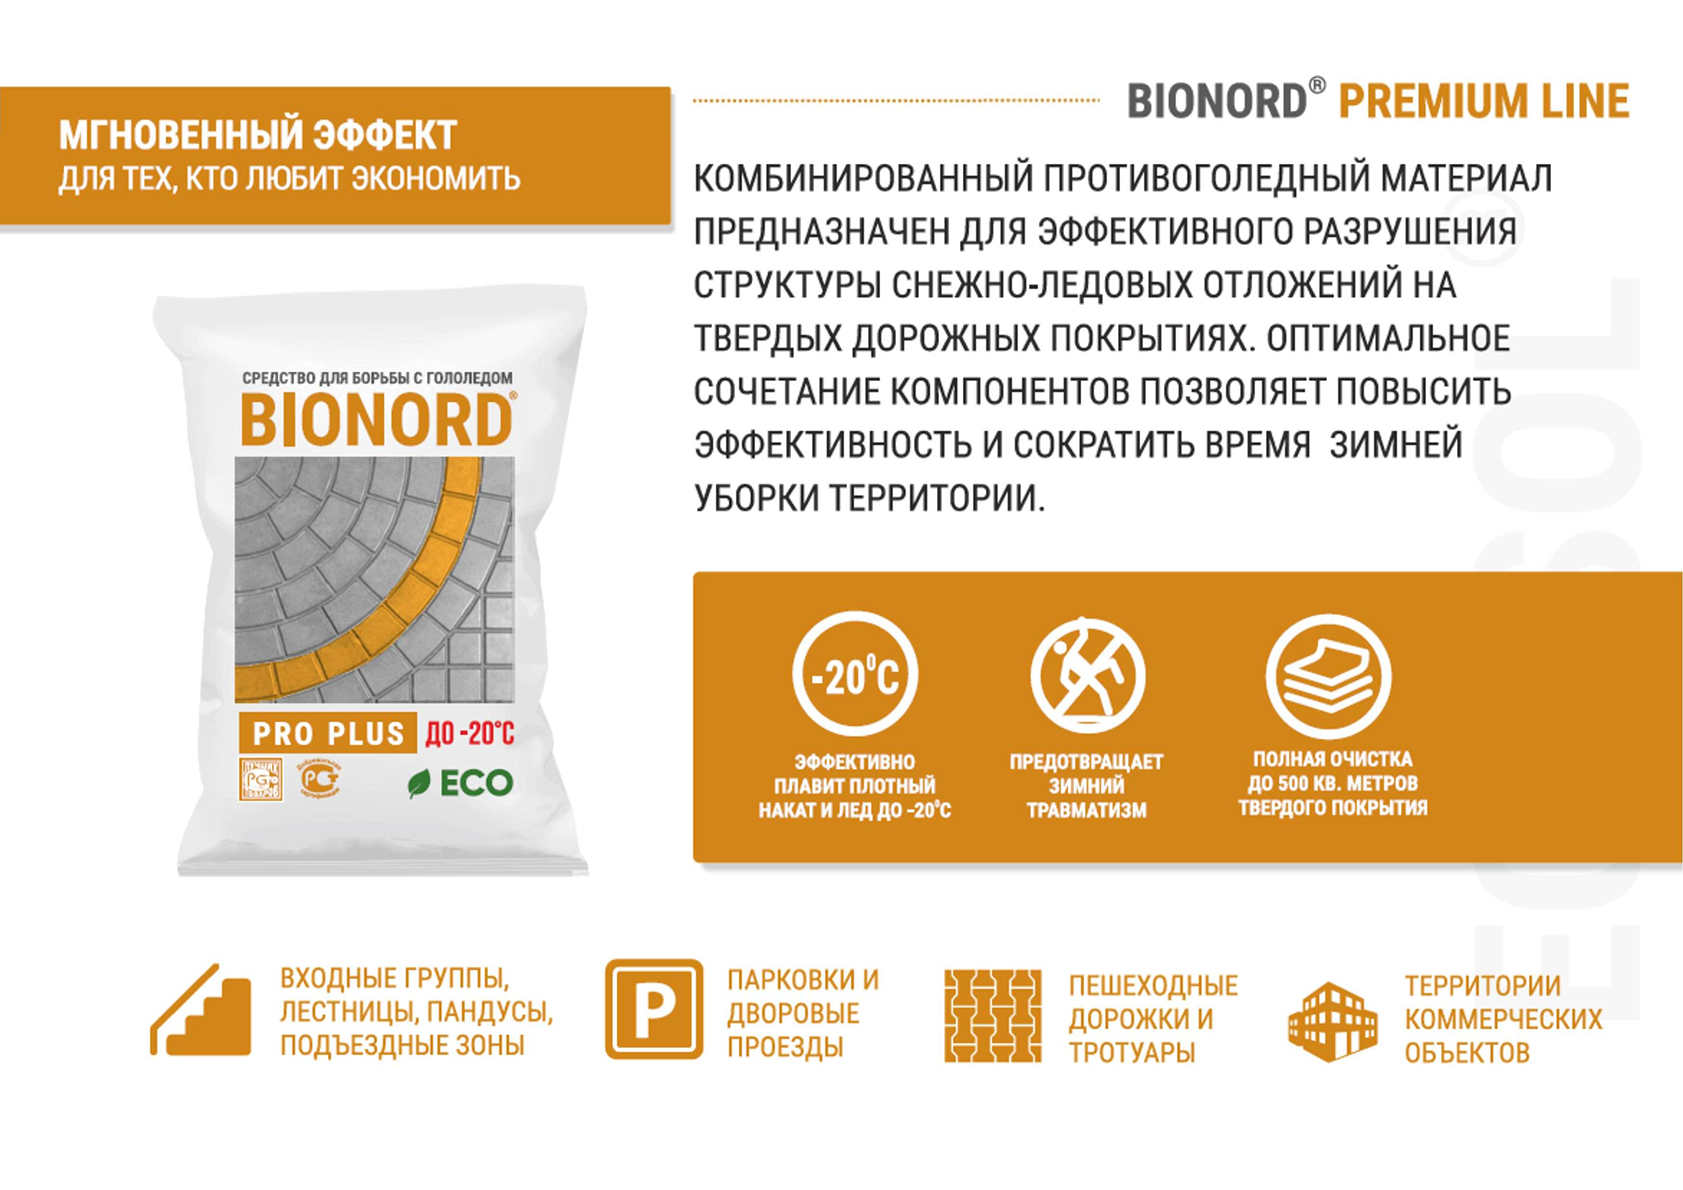 BIONORD PRO PLUS BIONORD® - Premium Line